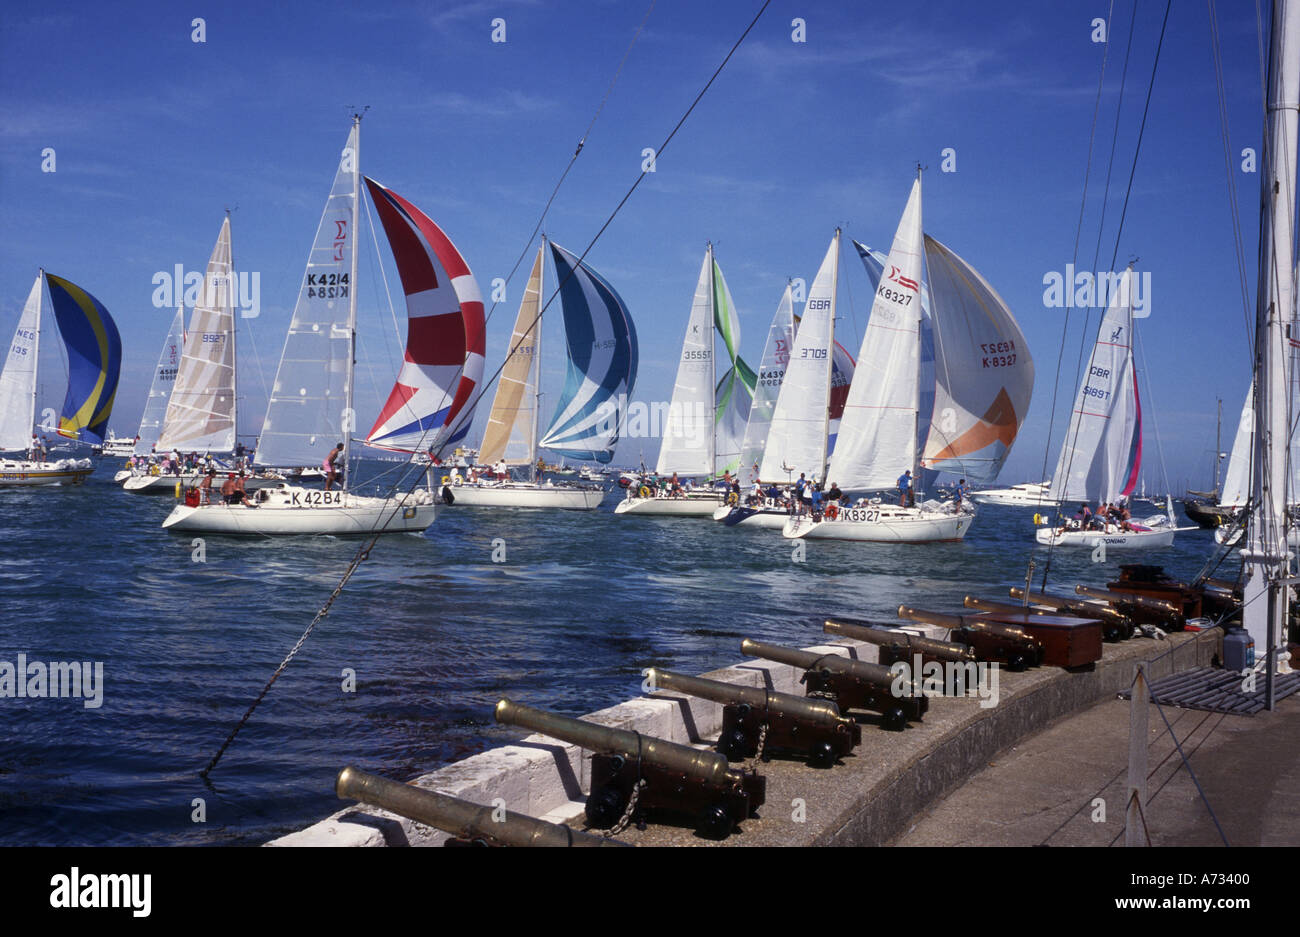 Yachts attraversando traguardo Cowes Week Isola di Wight in Inghilterra Immagini Stock